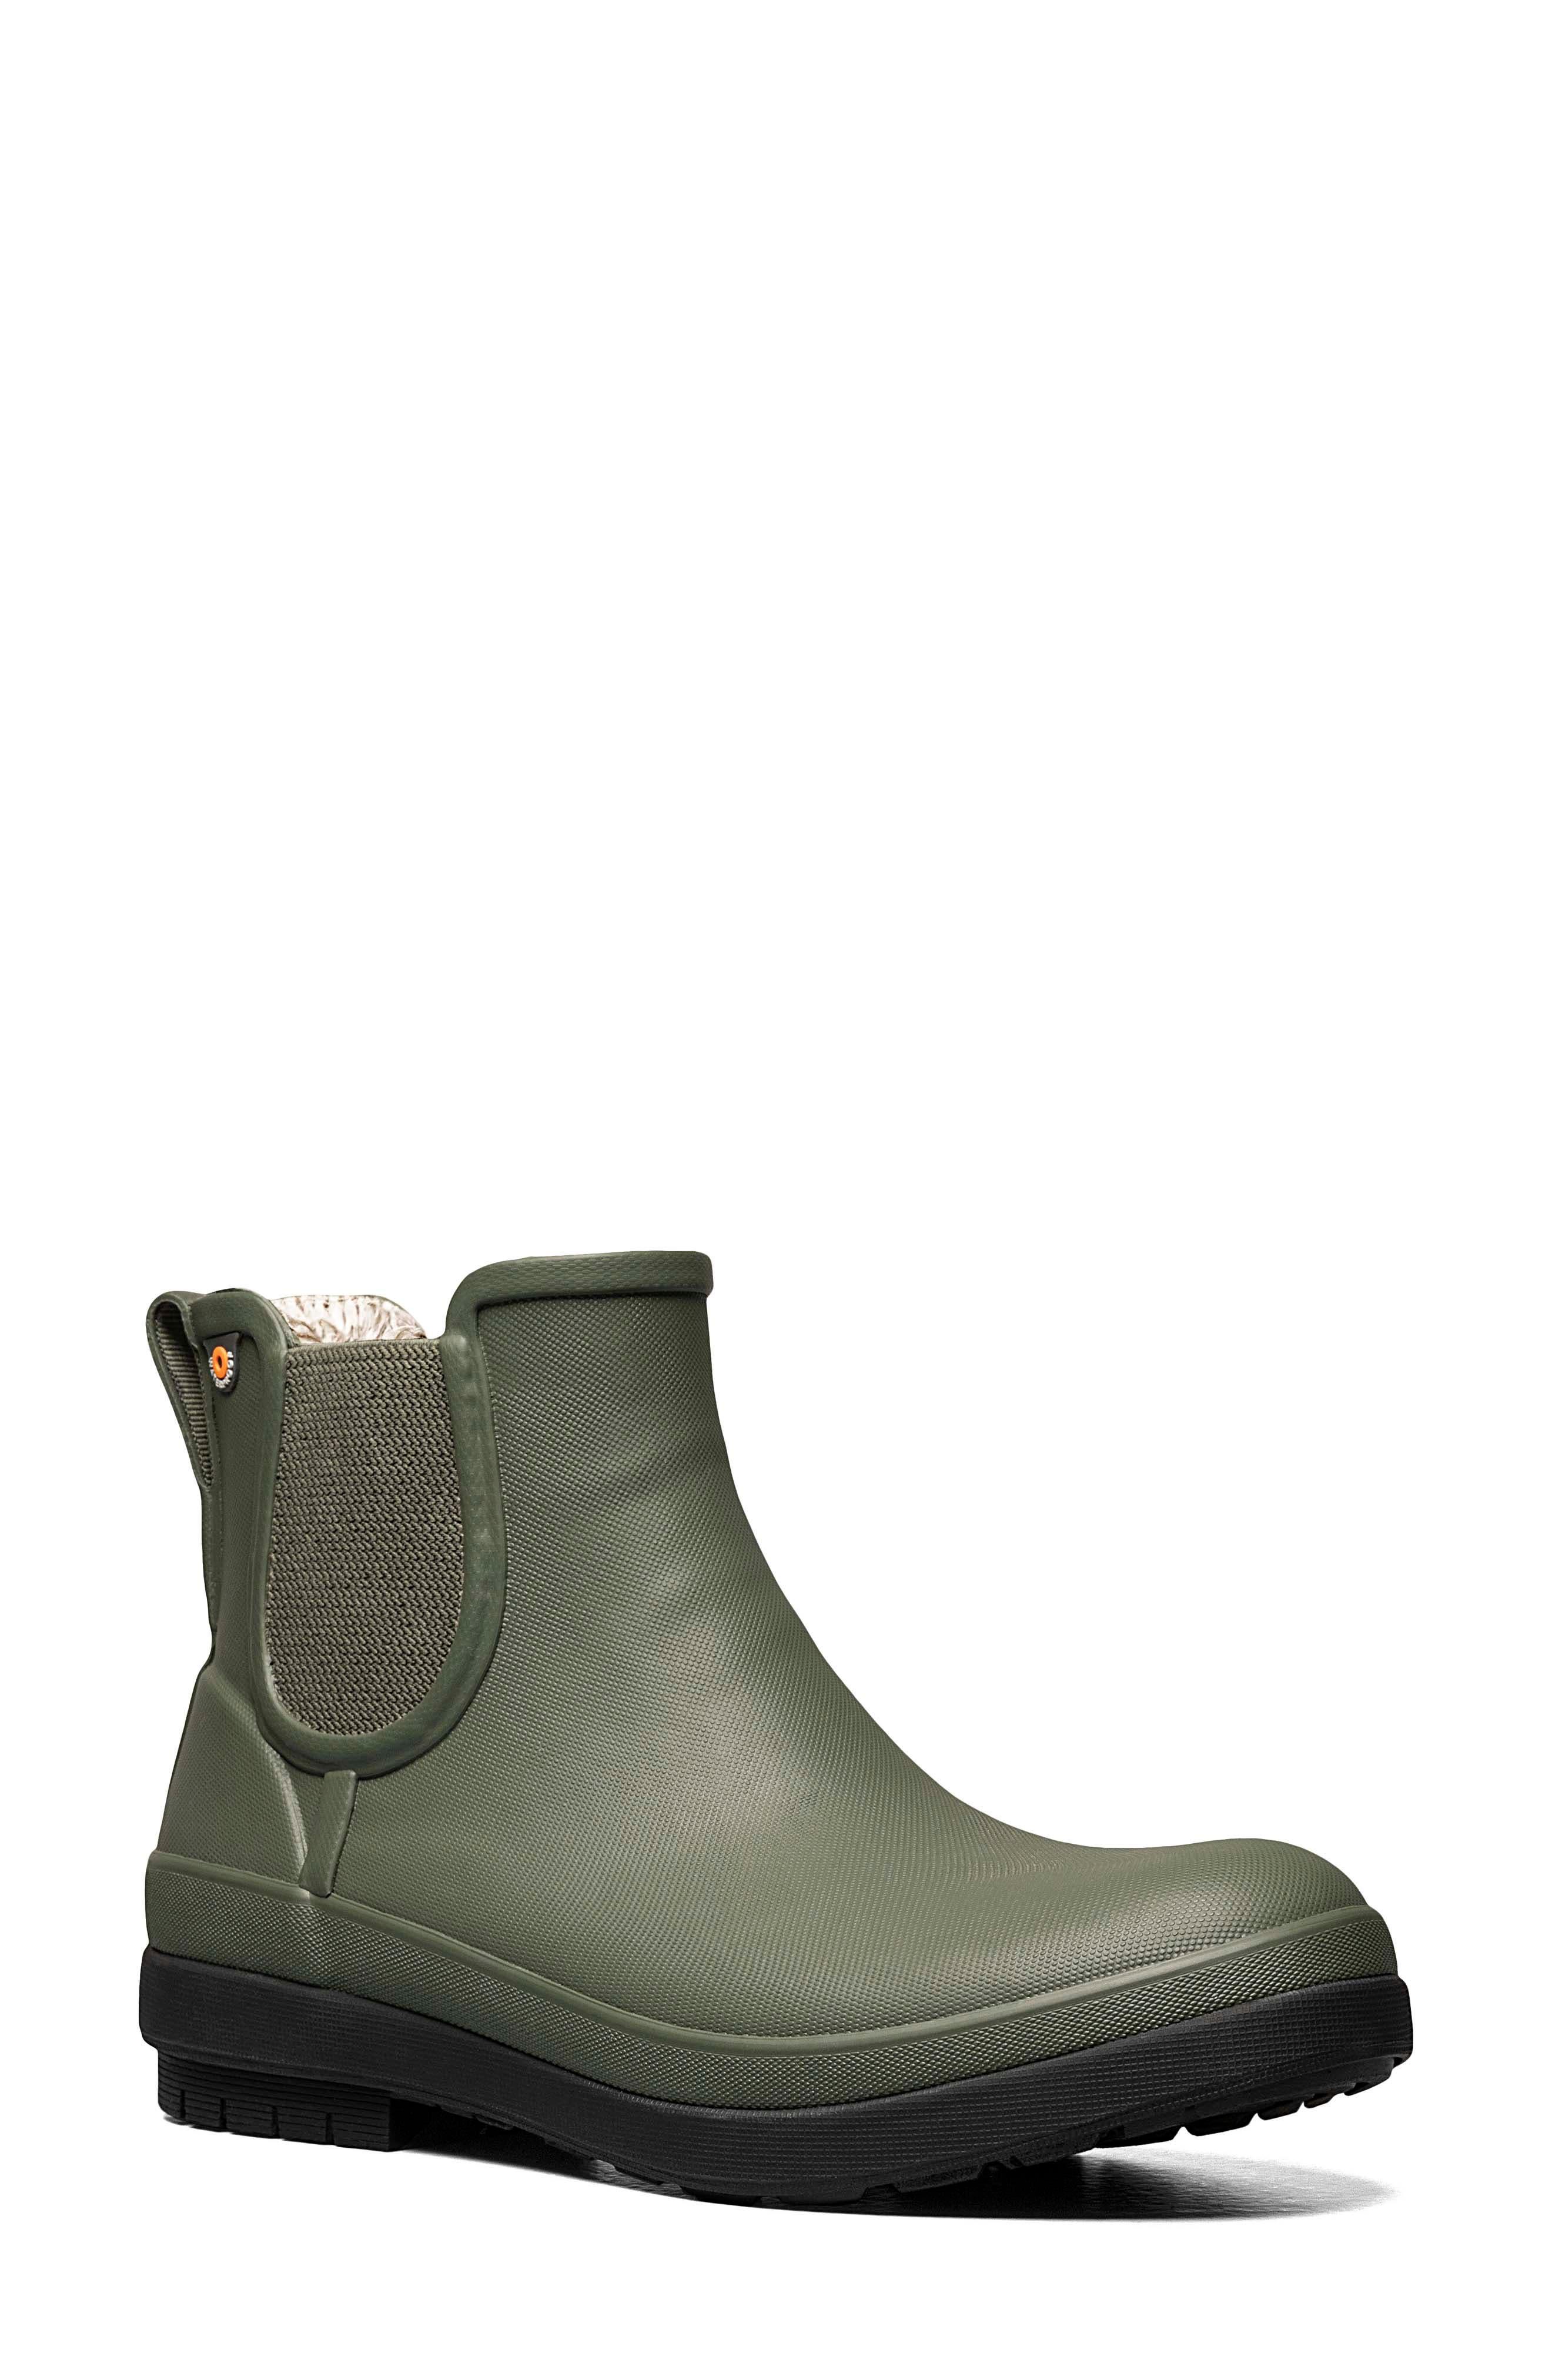 Amanda Ii Waterproof Insulated Chelsea Rain Boot